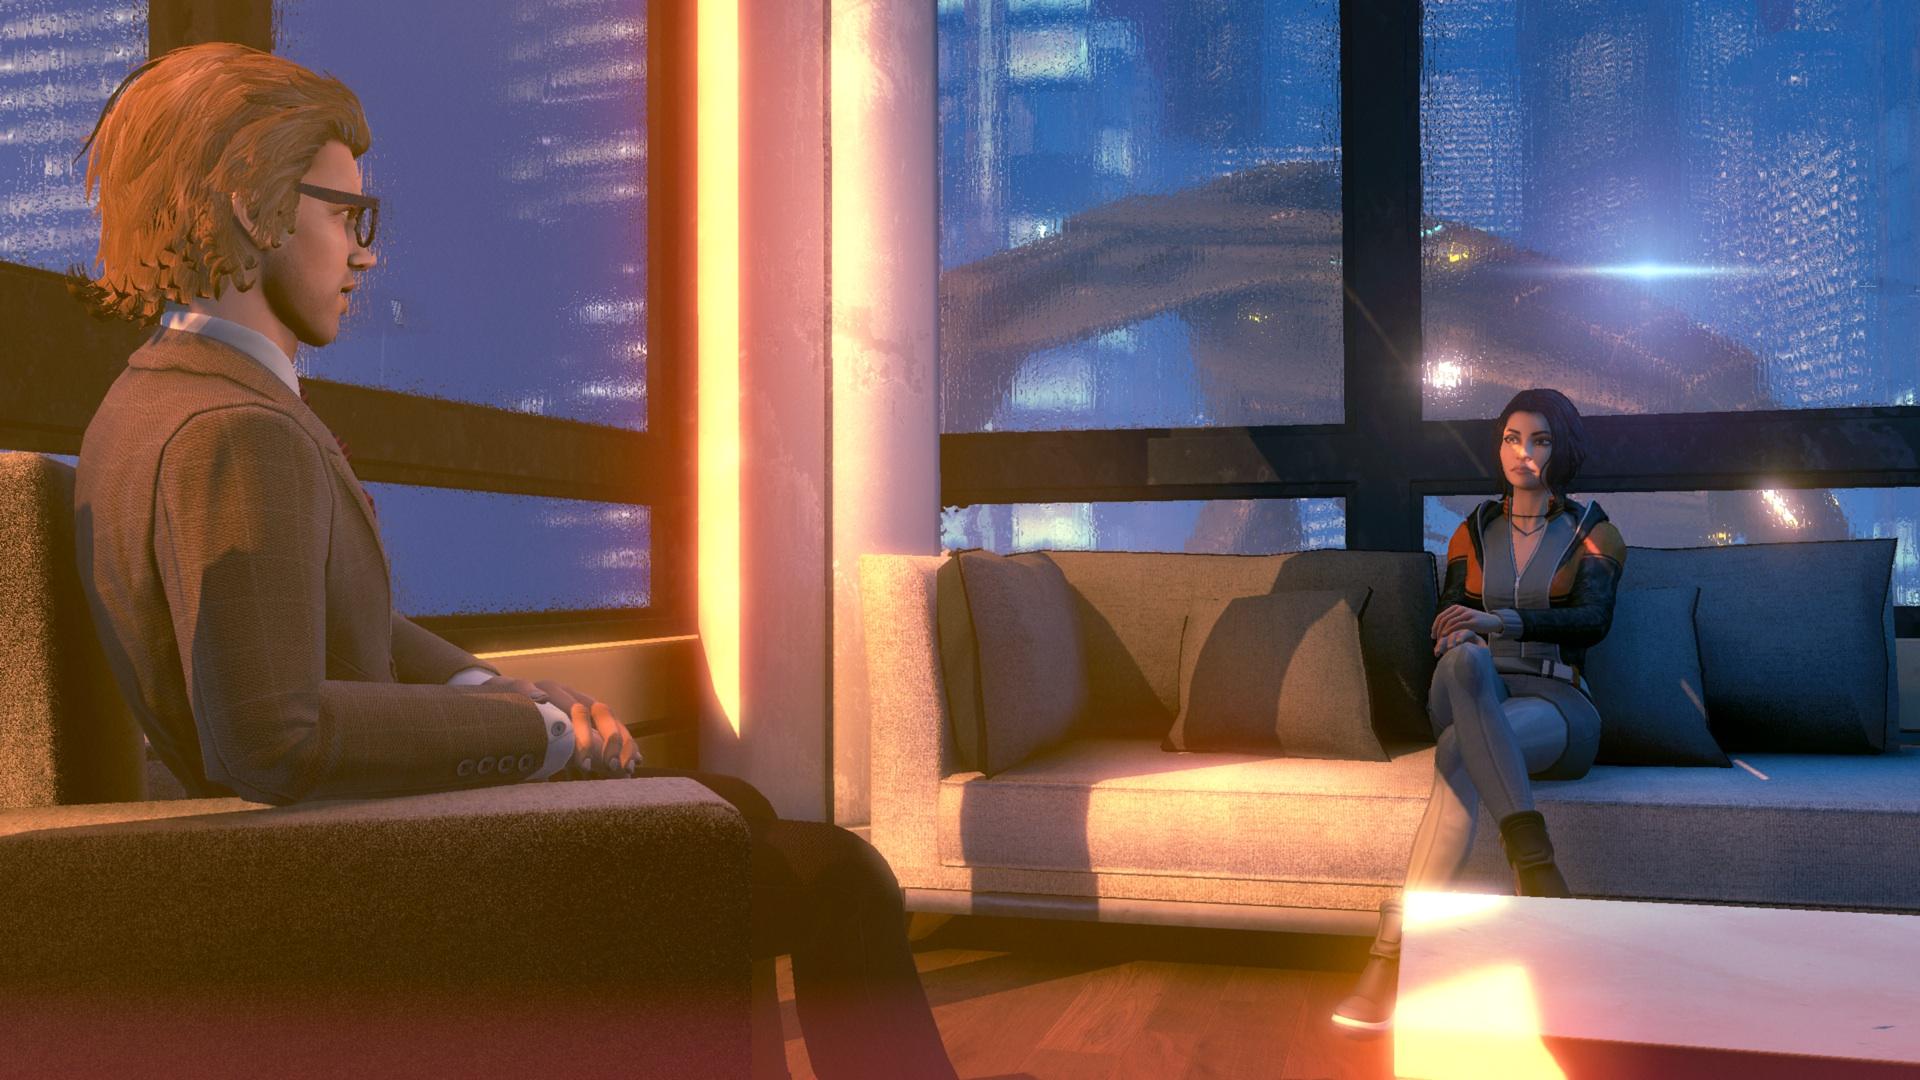 Скриншот Dreamfall Chapters: Books 1-5 (2014) REPACK ОТ R.G. МЕХАНИКИ скачать торрент бесплатно